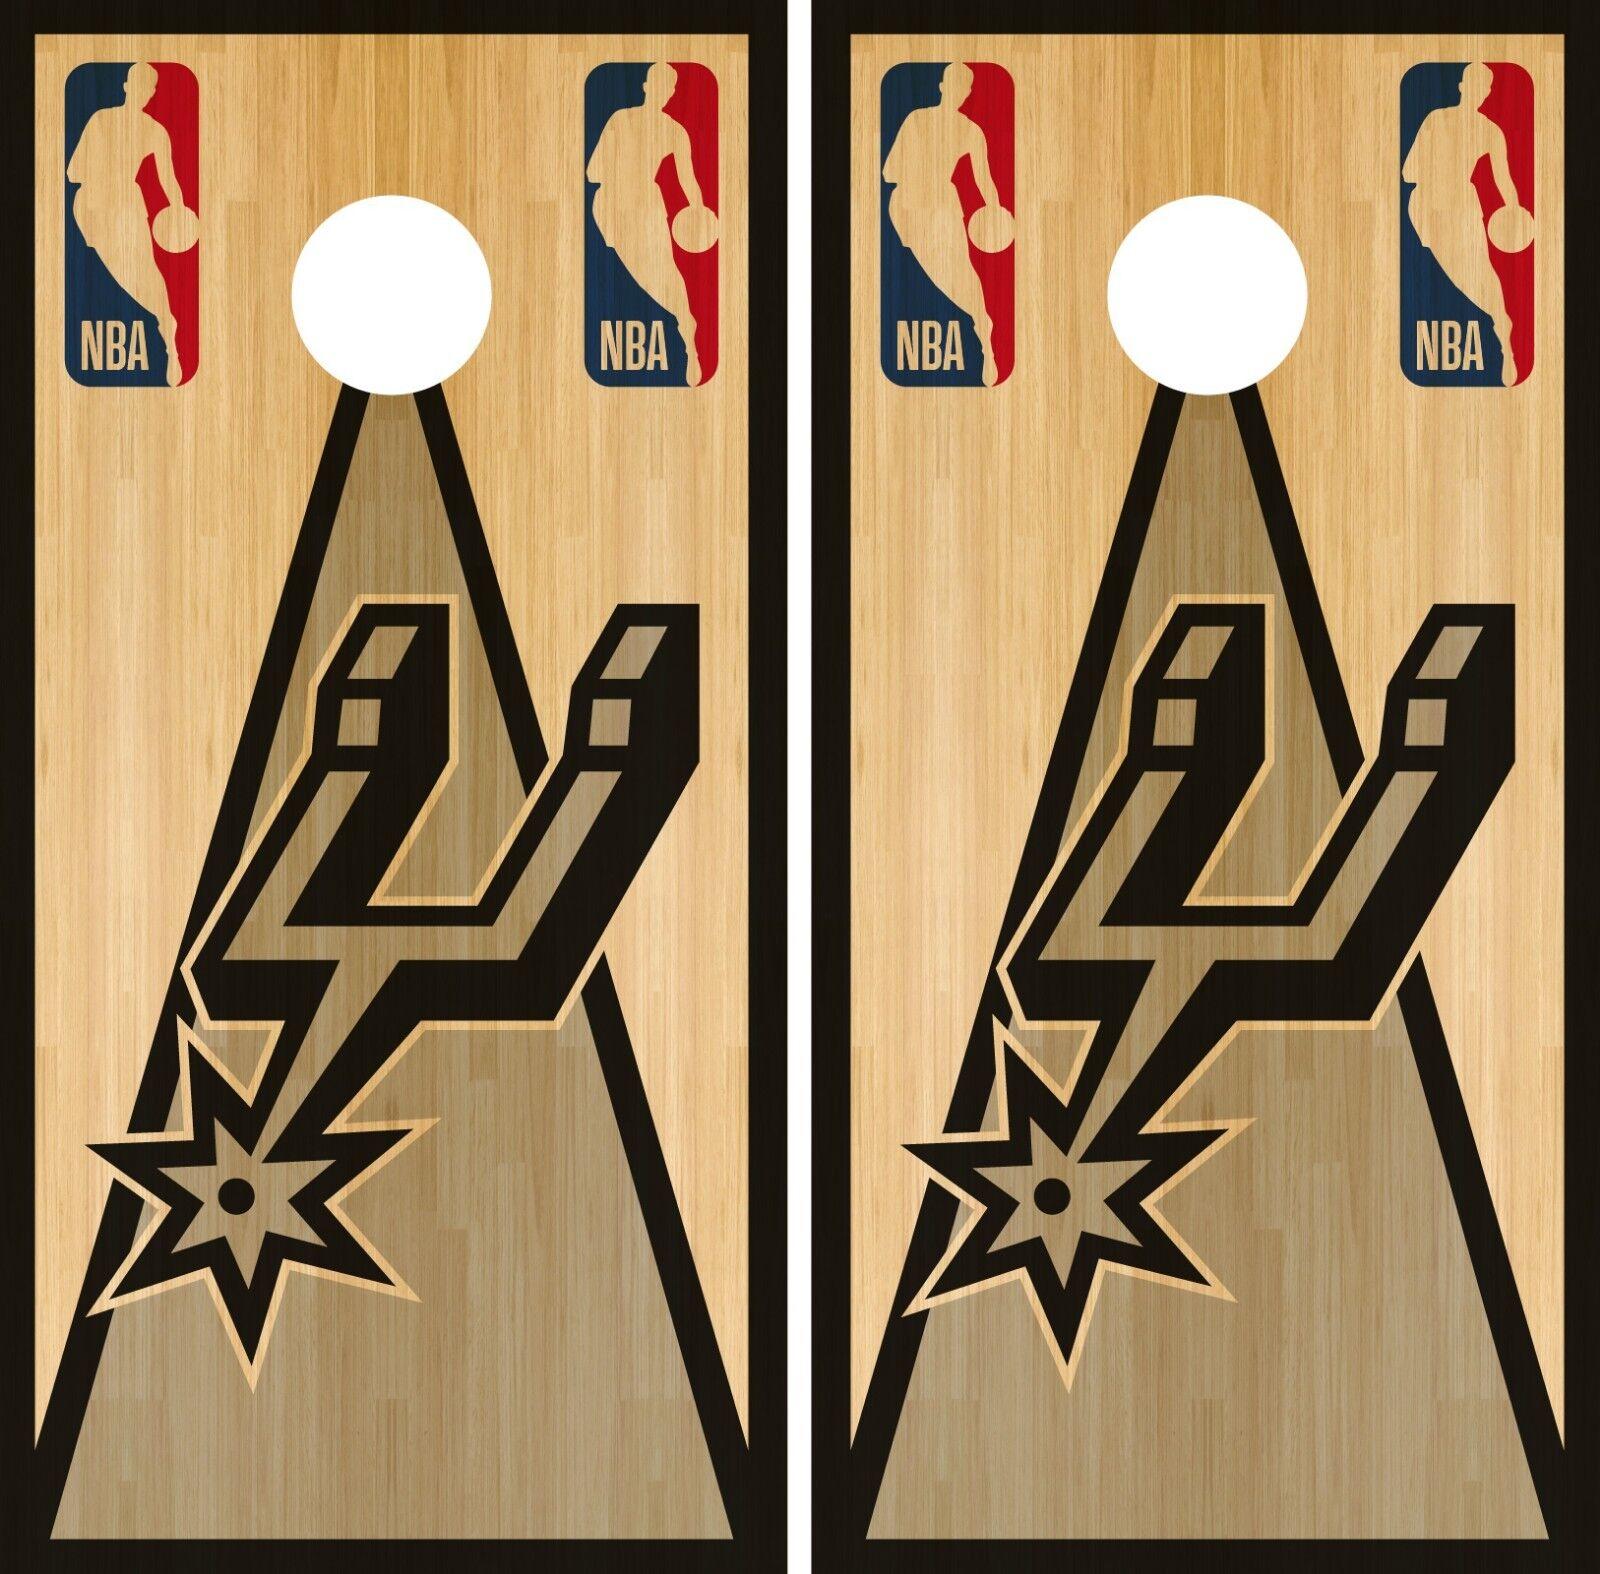 San Antonio Spurs  Cornhole Wrap NBA Game Skin Board Vinyl Decal Vintage CO707  no hesitation!buy now!